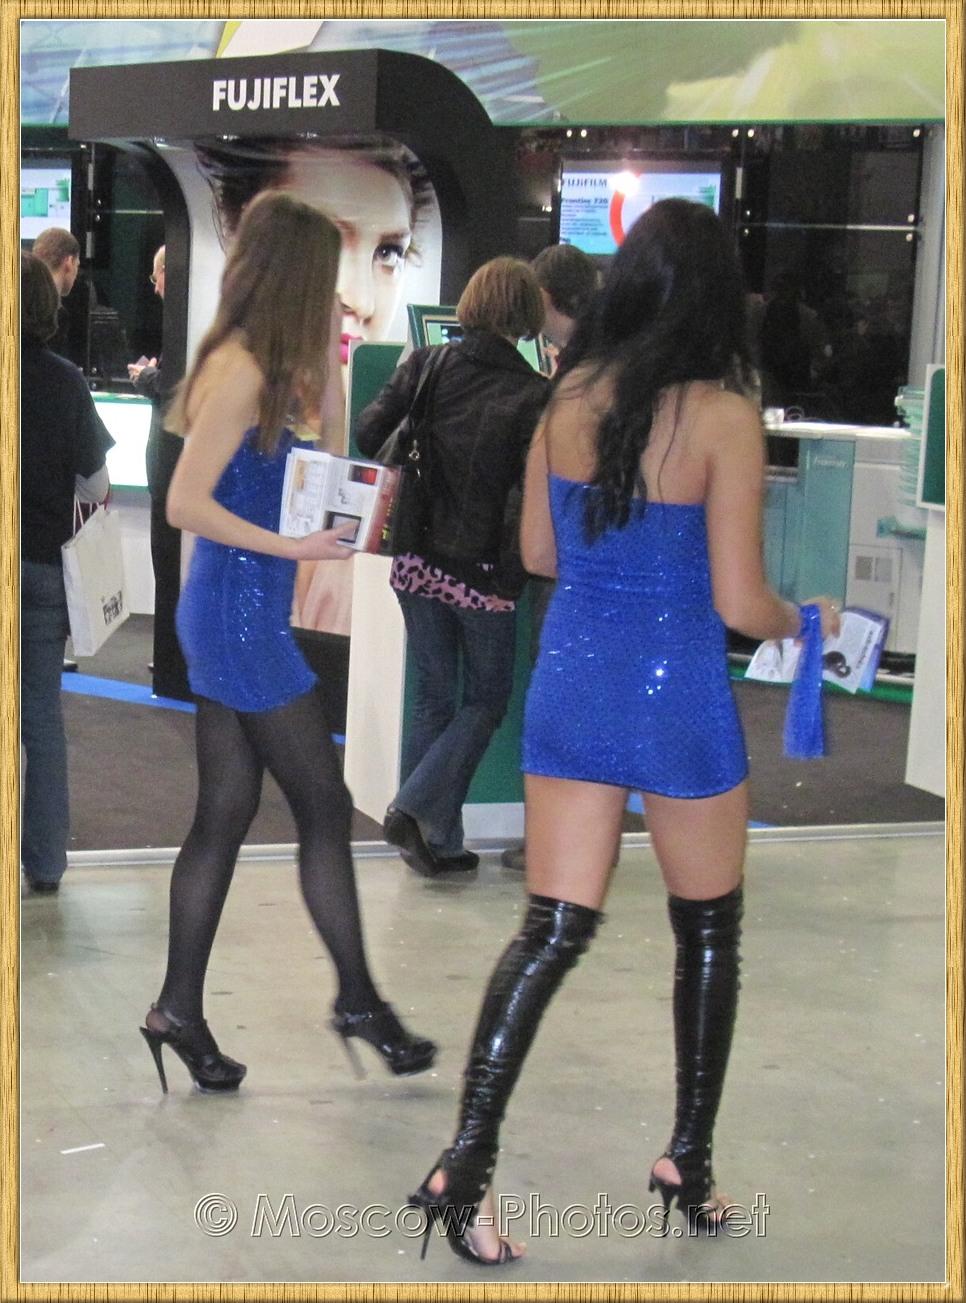 Promotional models in blue mini dresses